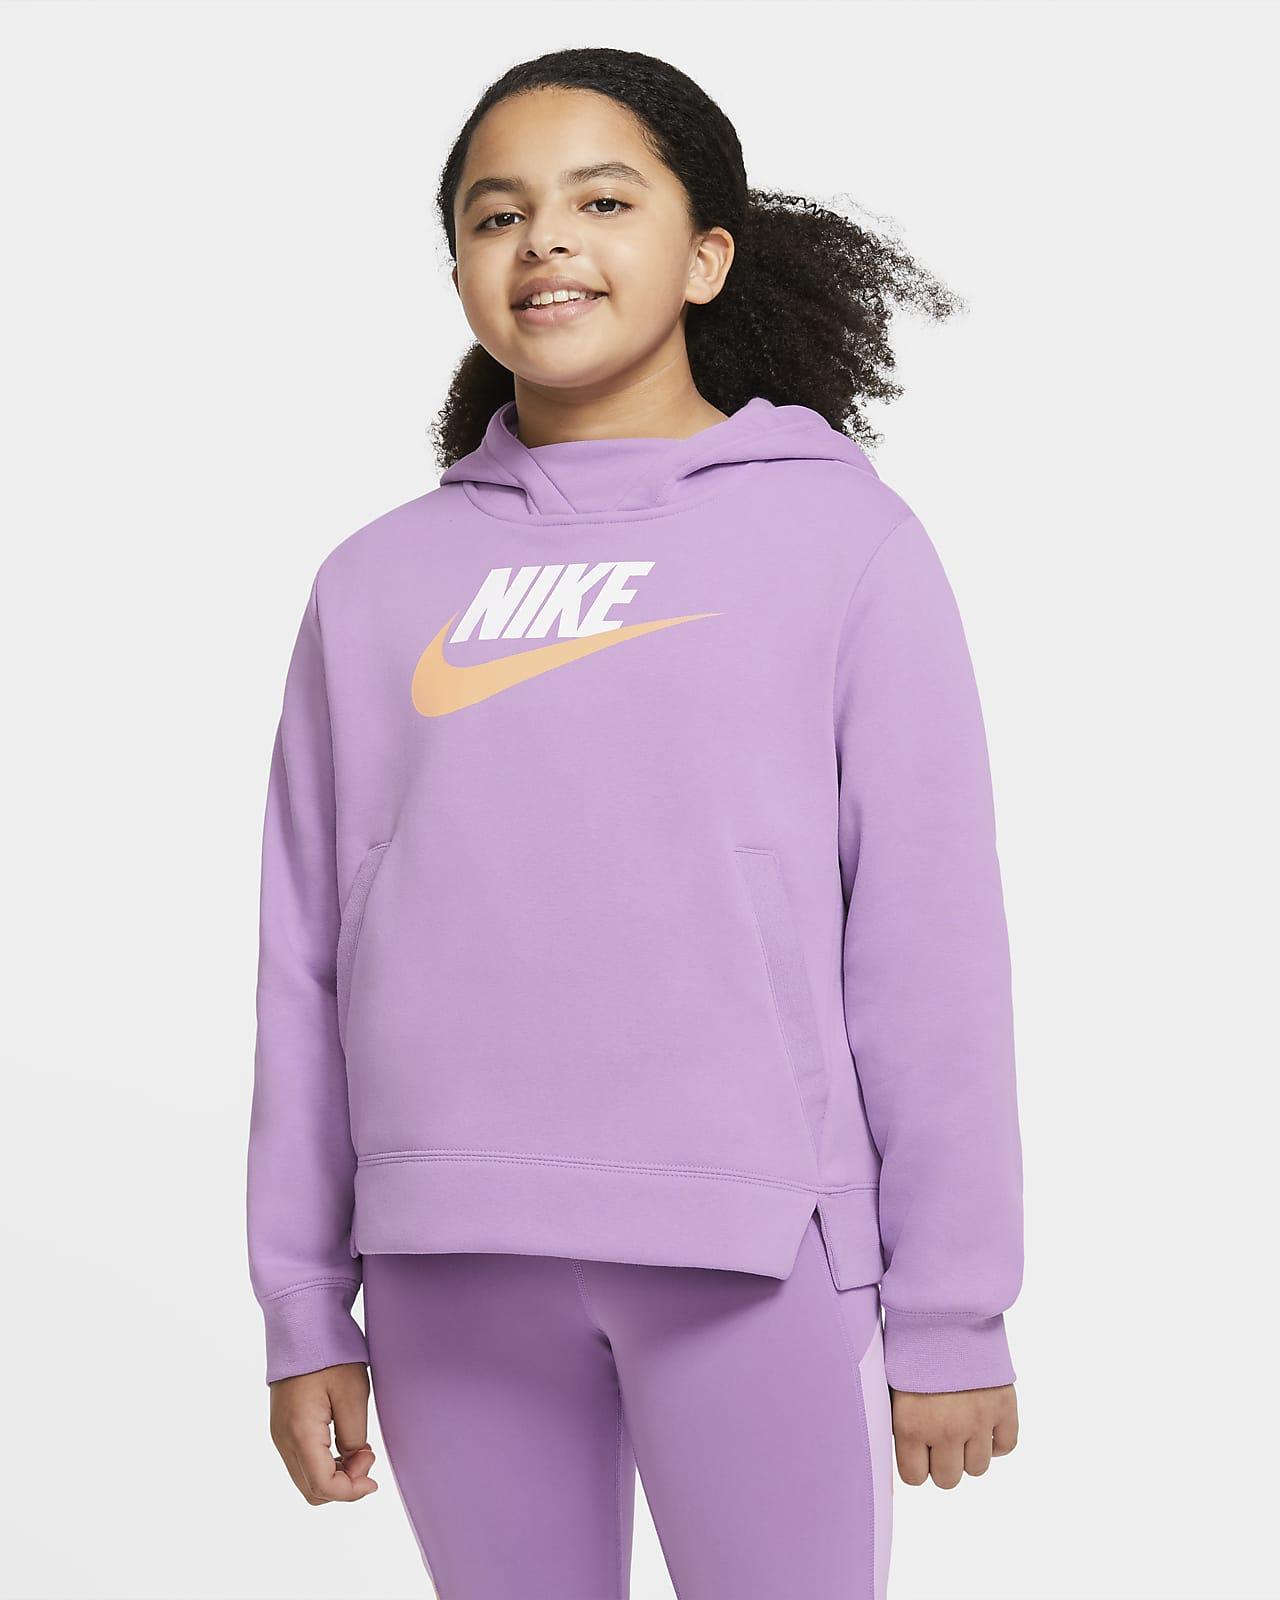 Sweat à capuche Nike Sportswear pour Fille plus âgée (grande taille)